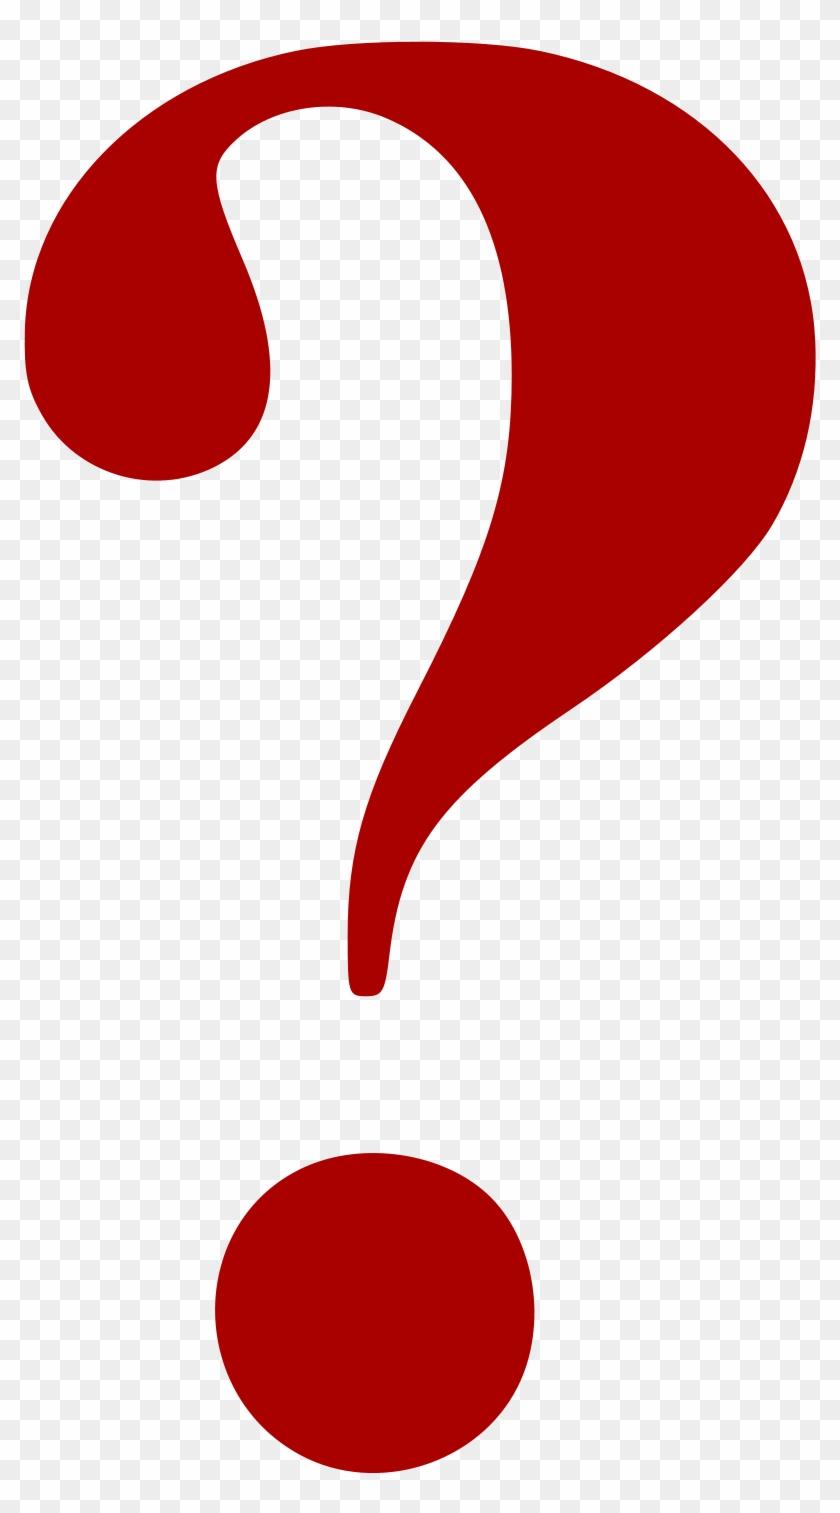 question marks clip art photo medium size question mark dark red rh clipartmax com question mark clip art images free question mark clip art images